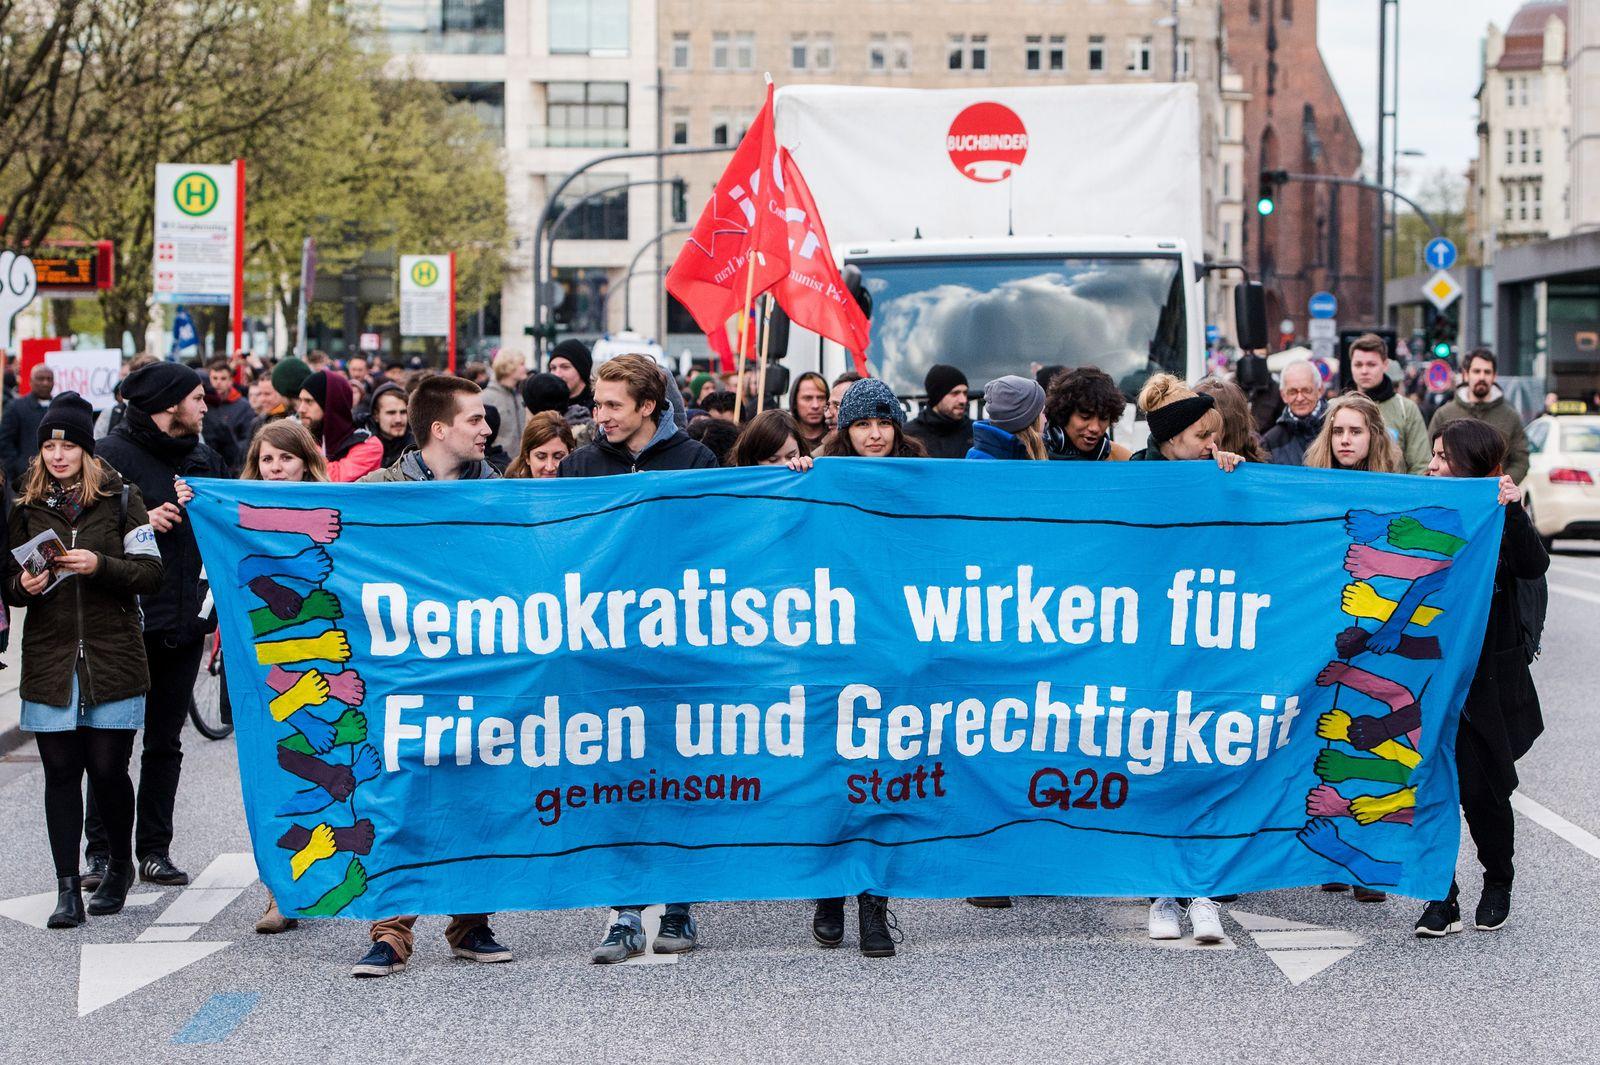 G20 / Hamburg / Demonstration / Protest